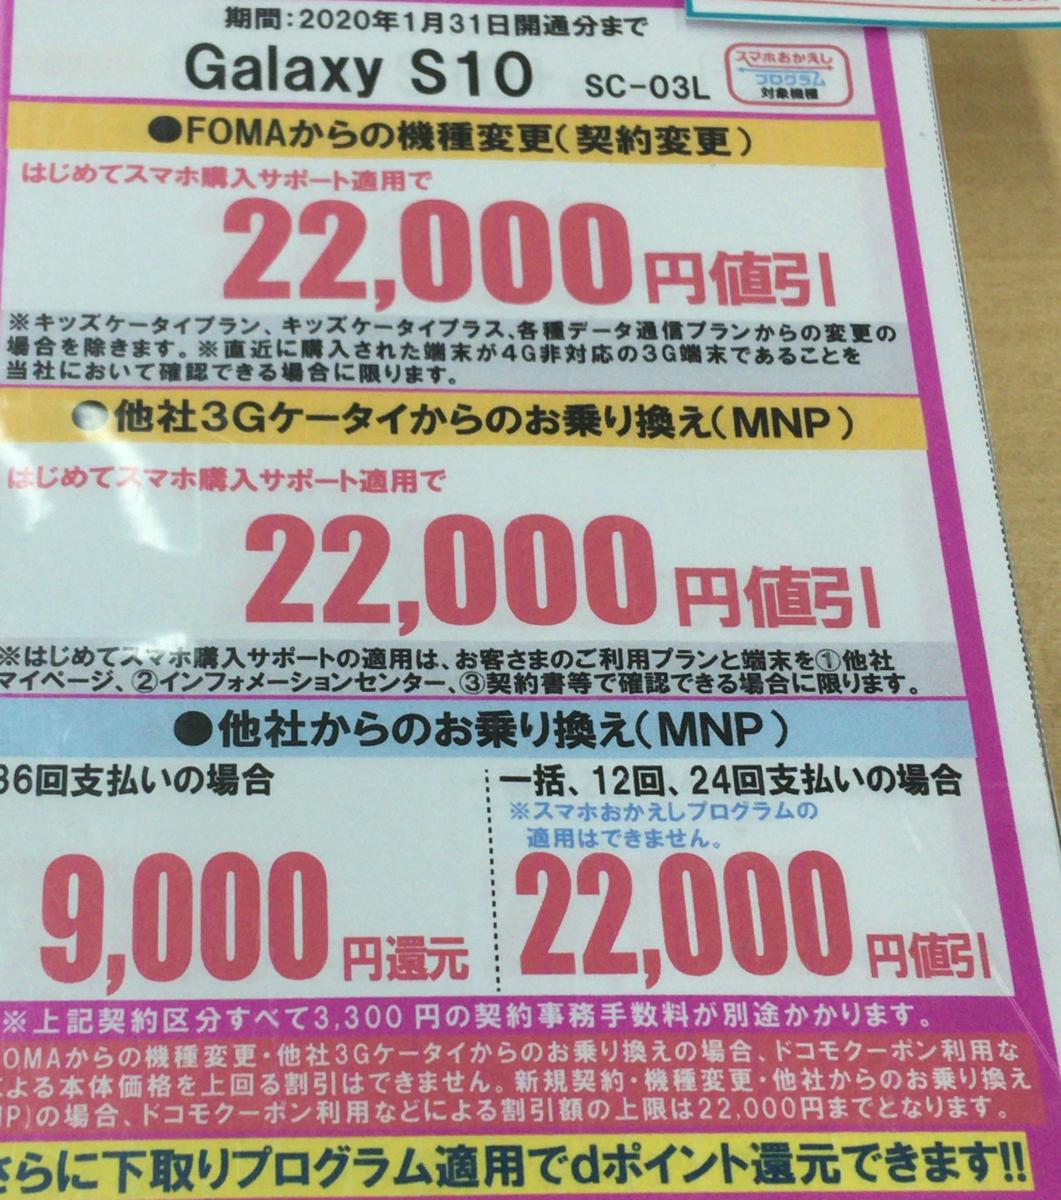 f:id:koiwai_chinatsu:20200113224045p:plain